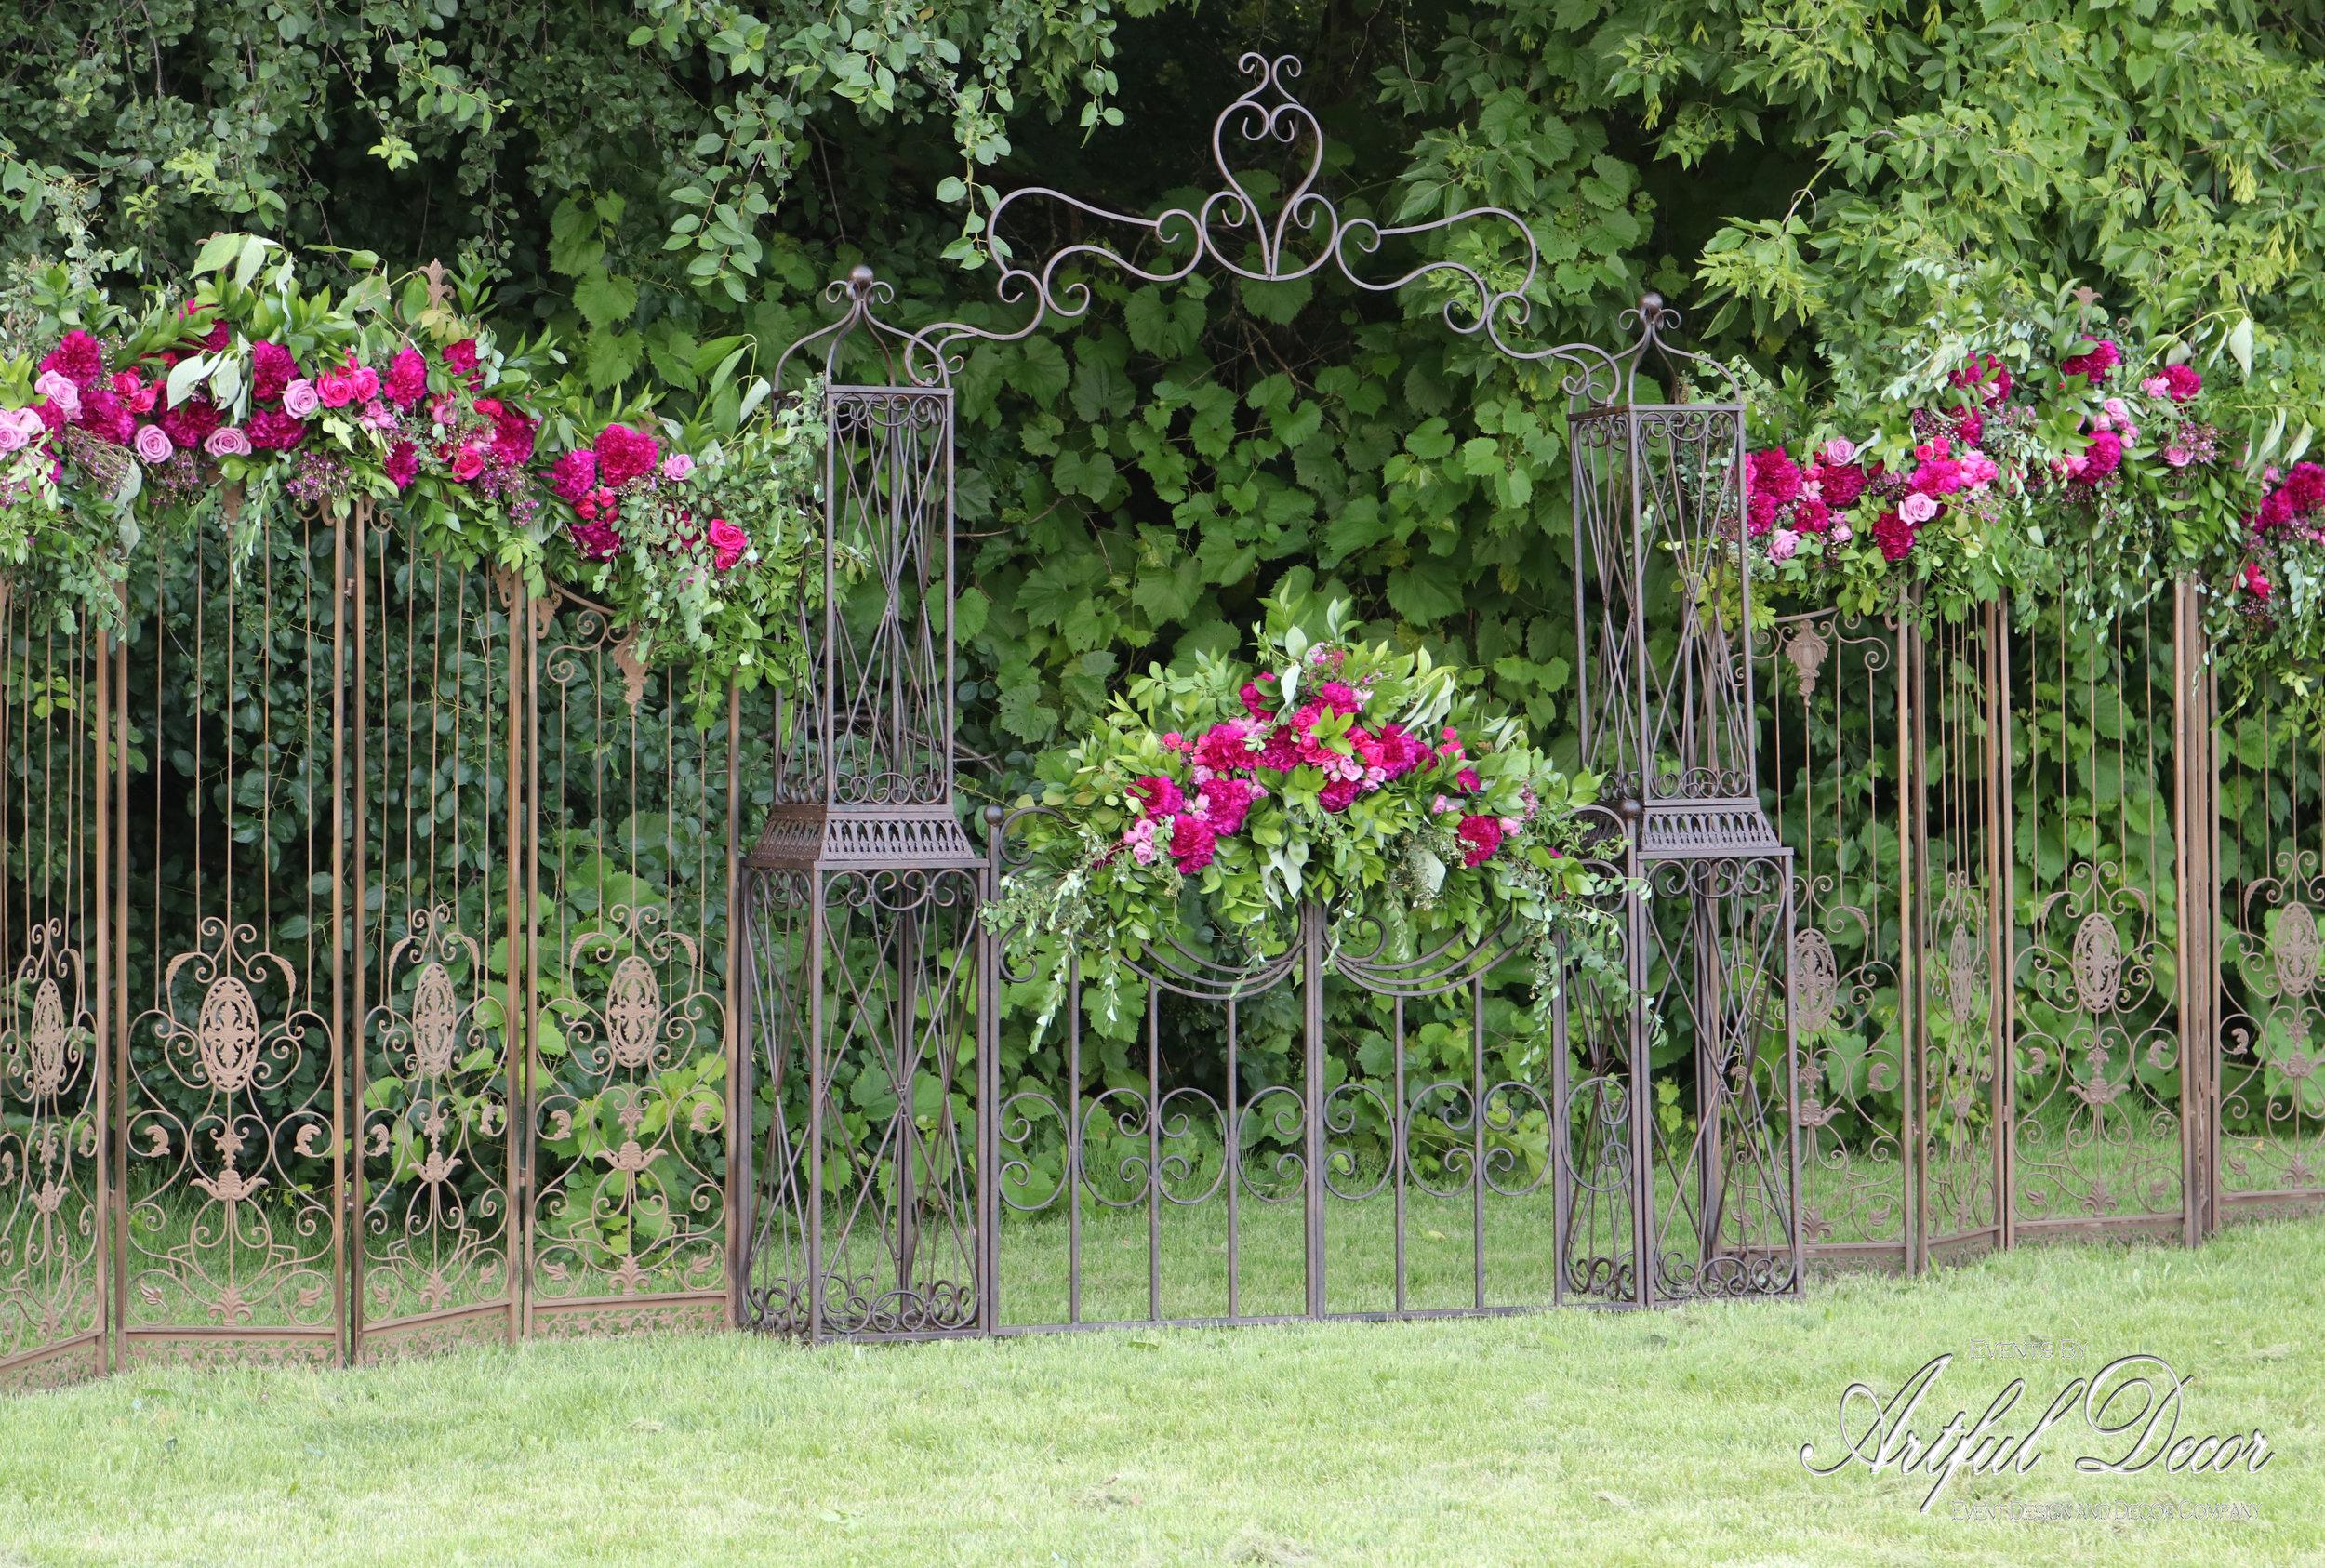 Garden Gate 7 Copyright.jpg